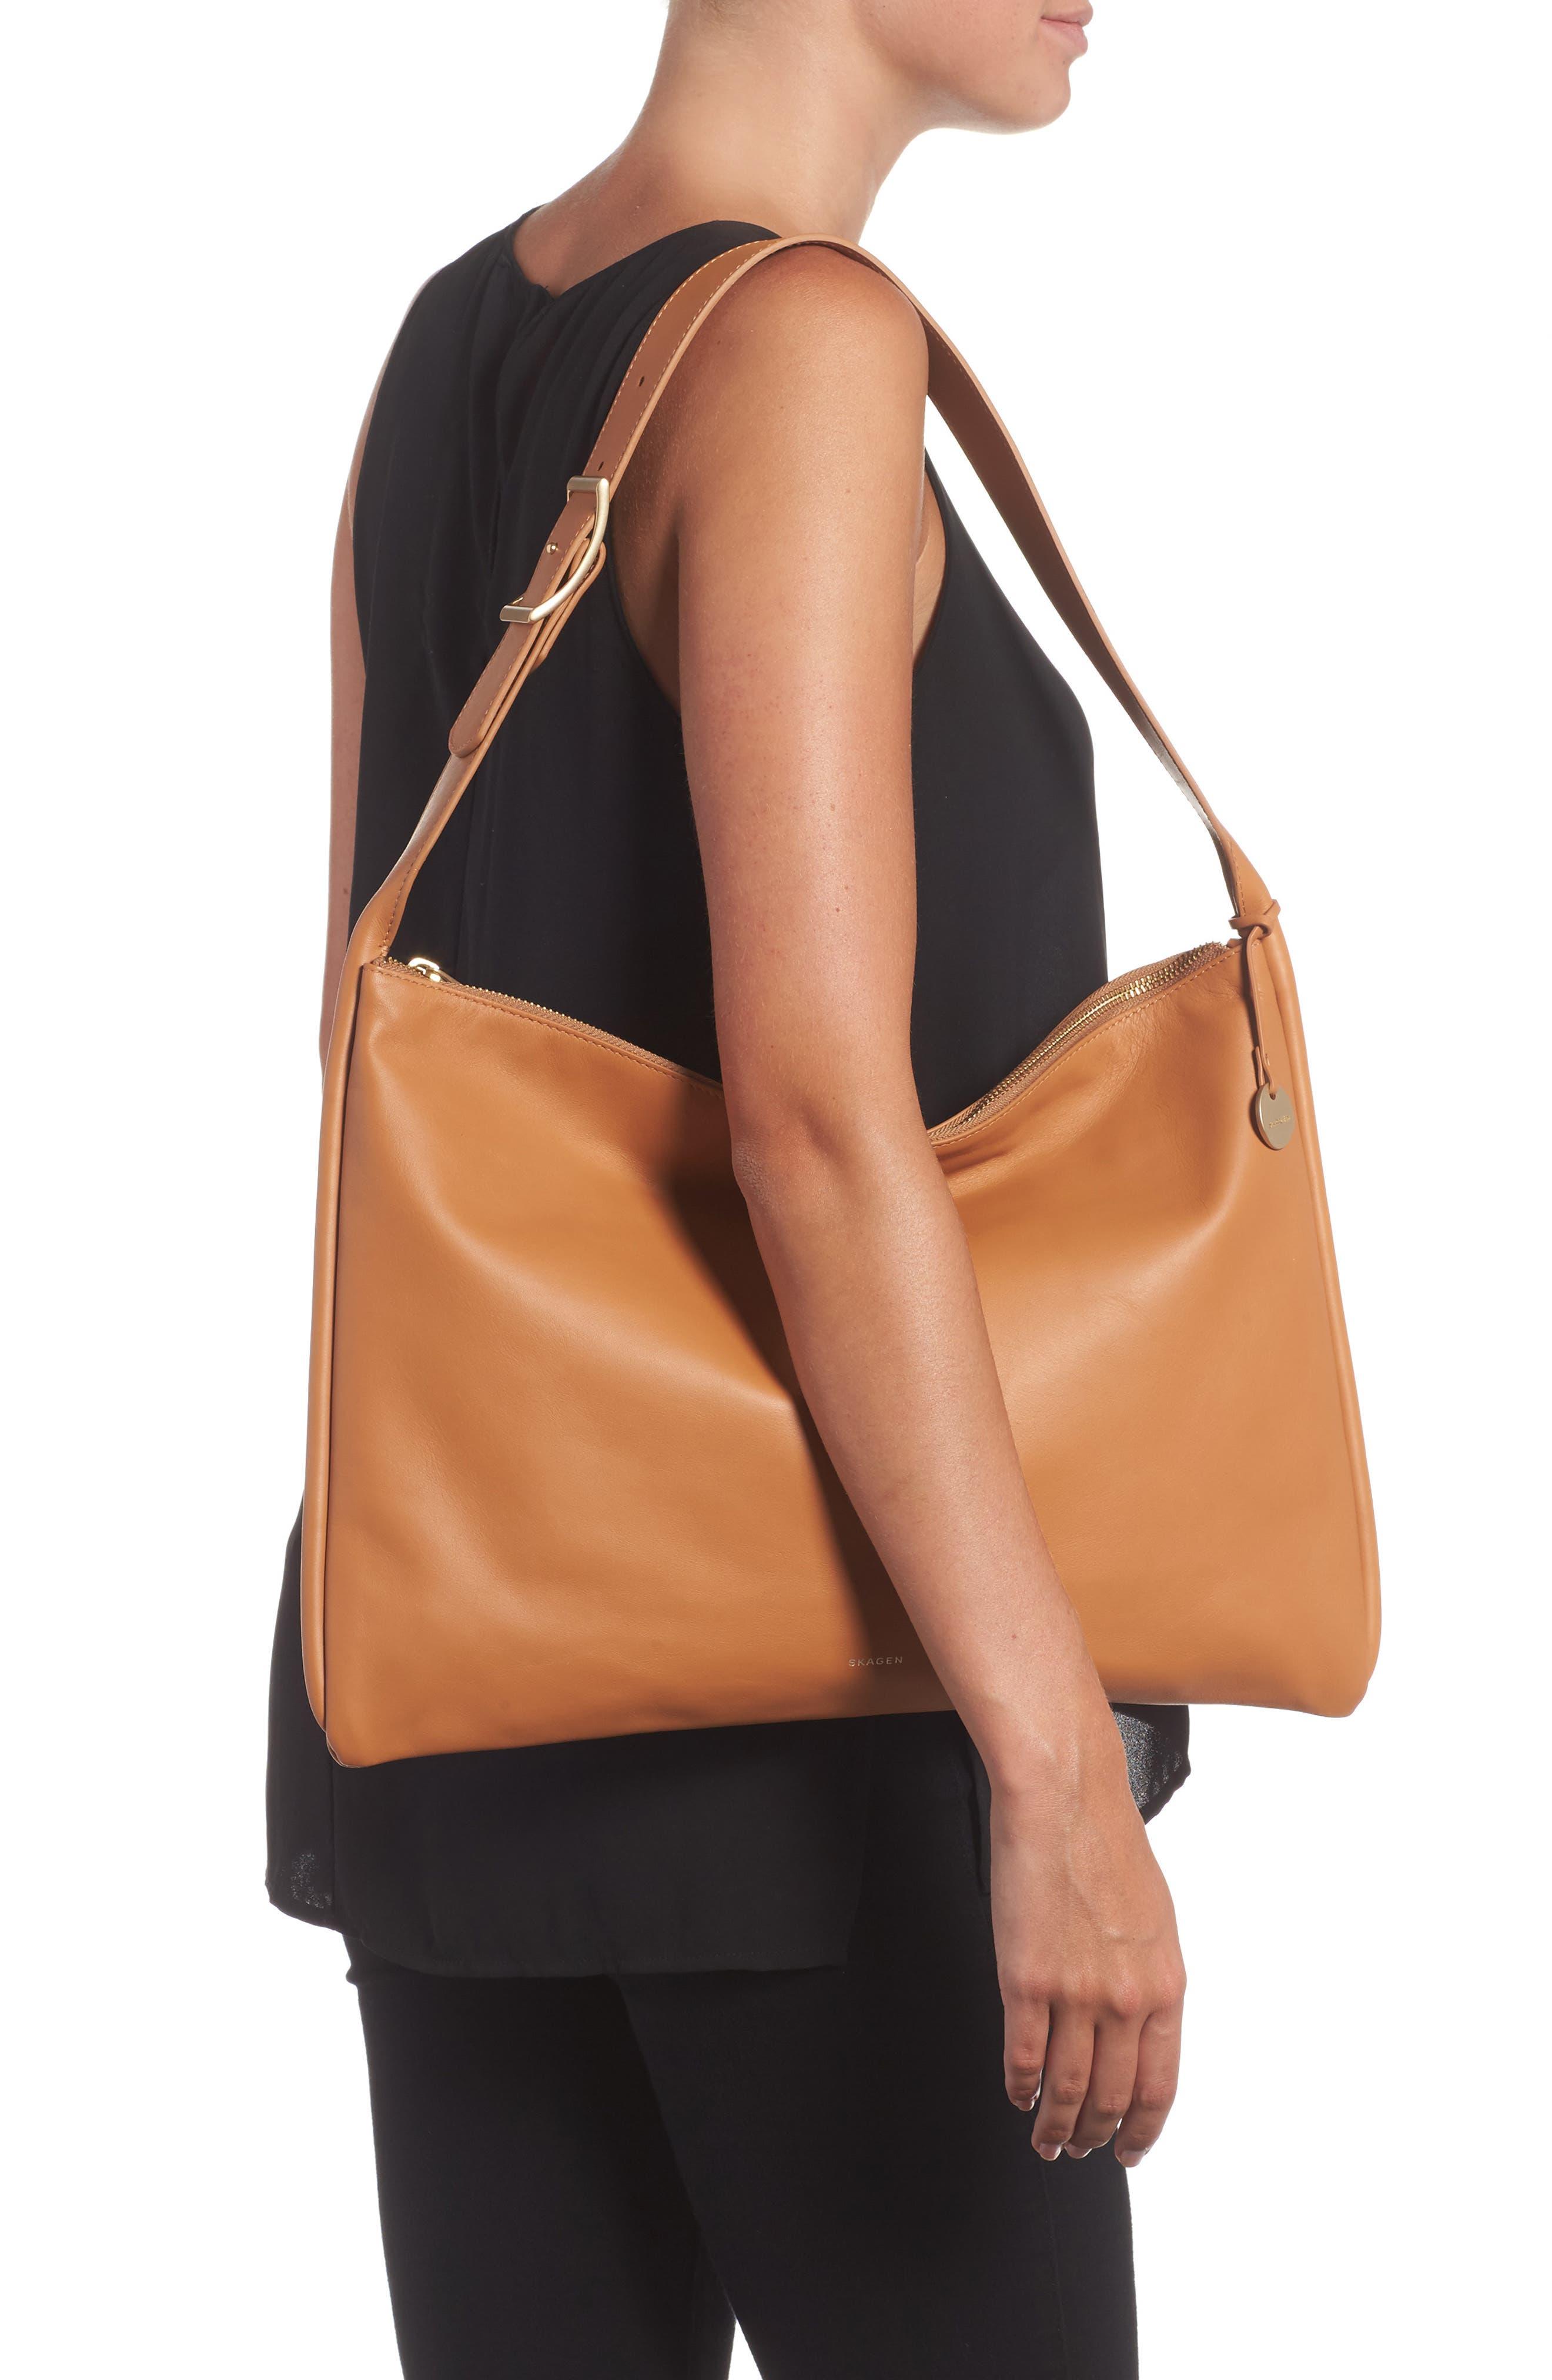 Anesa Leather Shoulder Bag,                             Alternate thumbnail 2, color,                             Tan